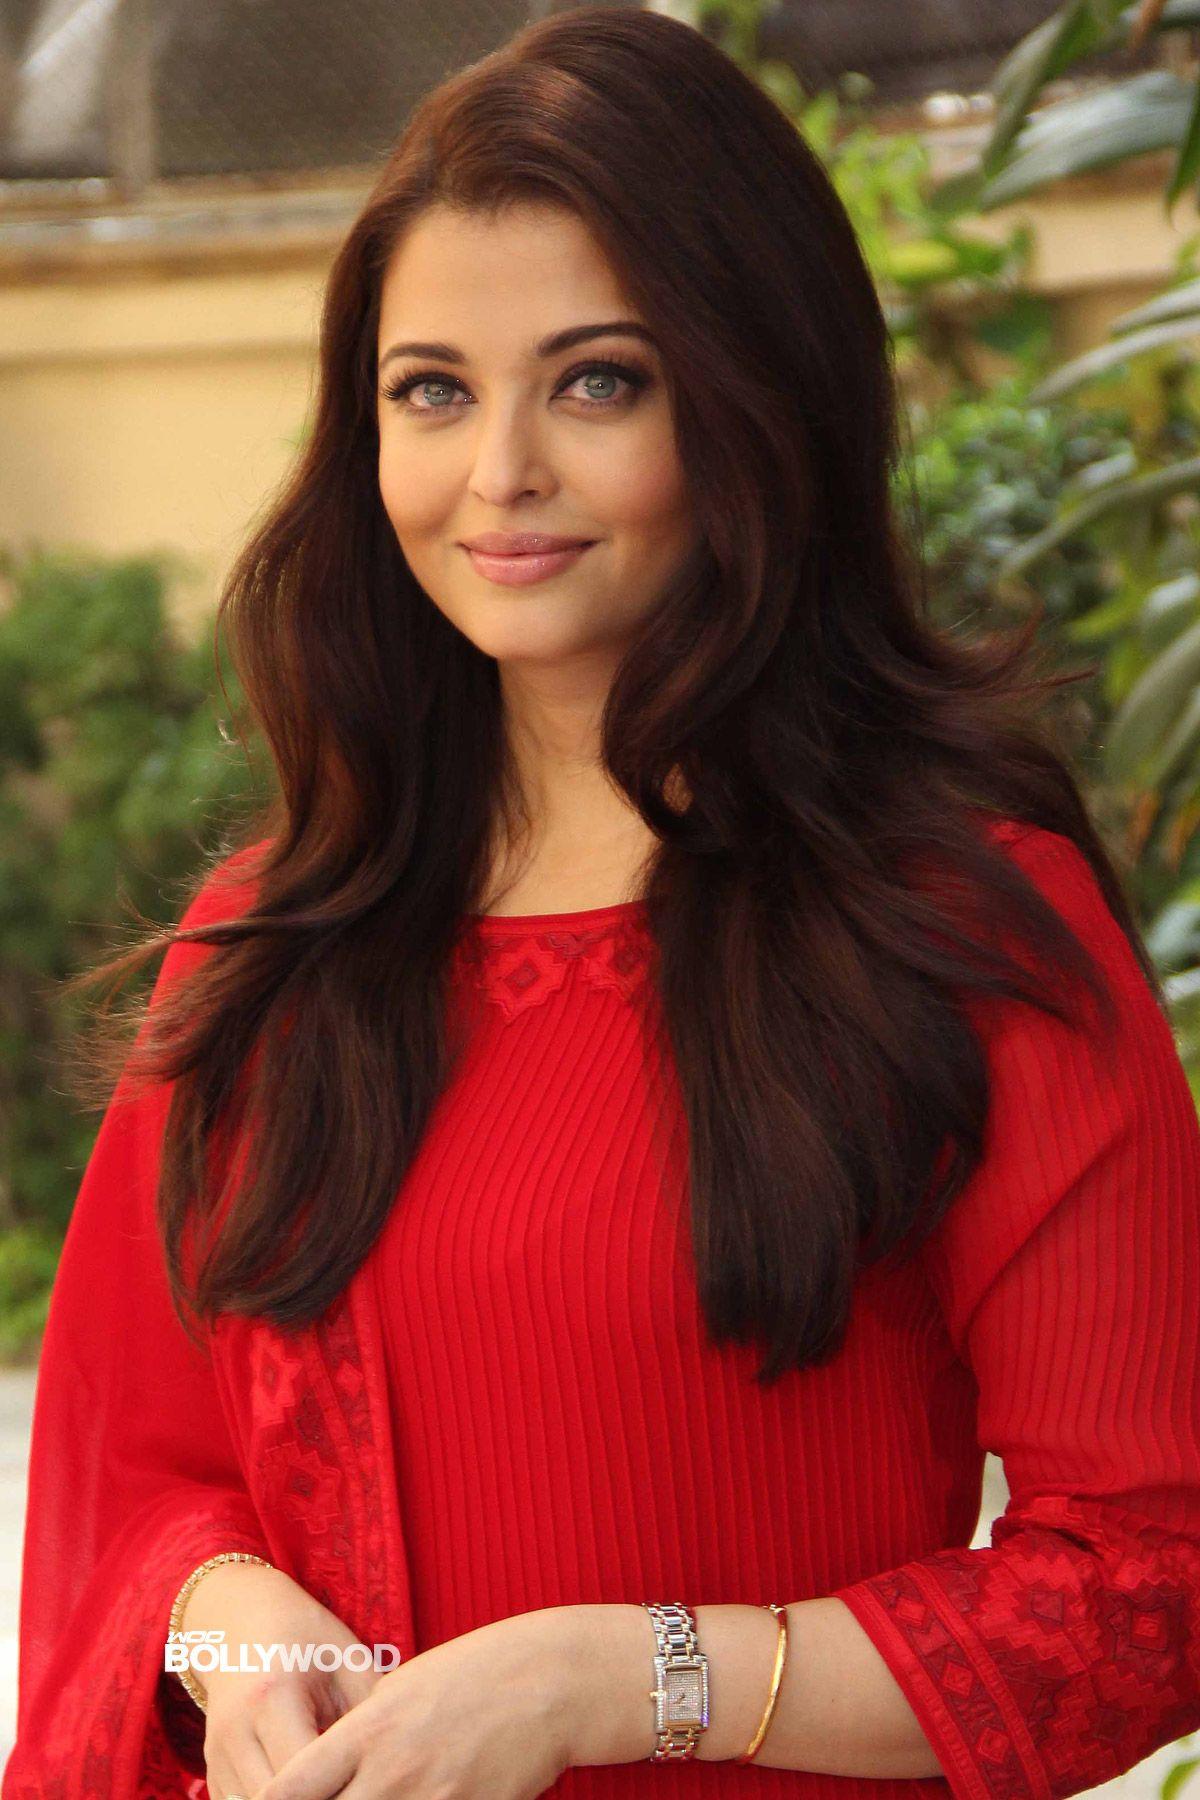 Aishwarya Rai Beauty And Fitness Aishwarya Rai Bachchan